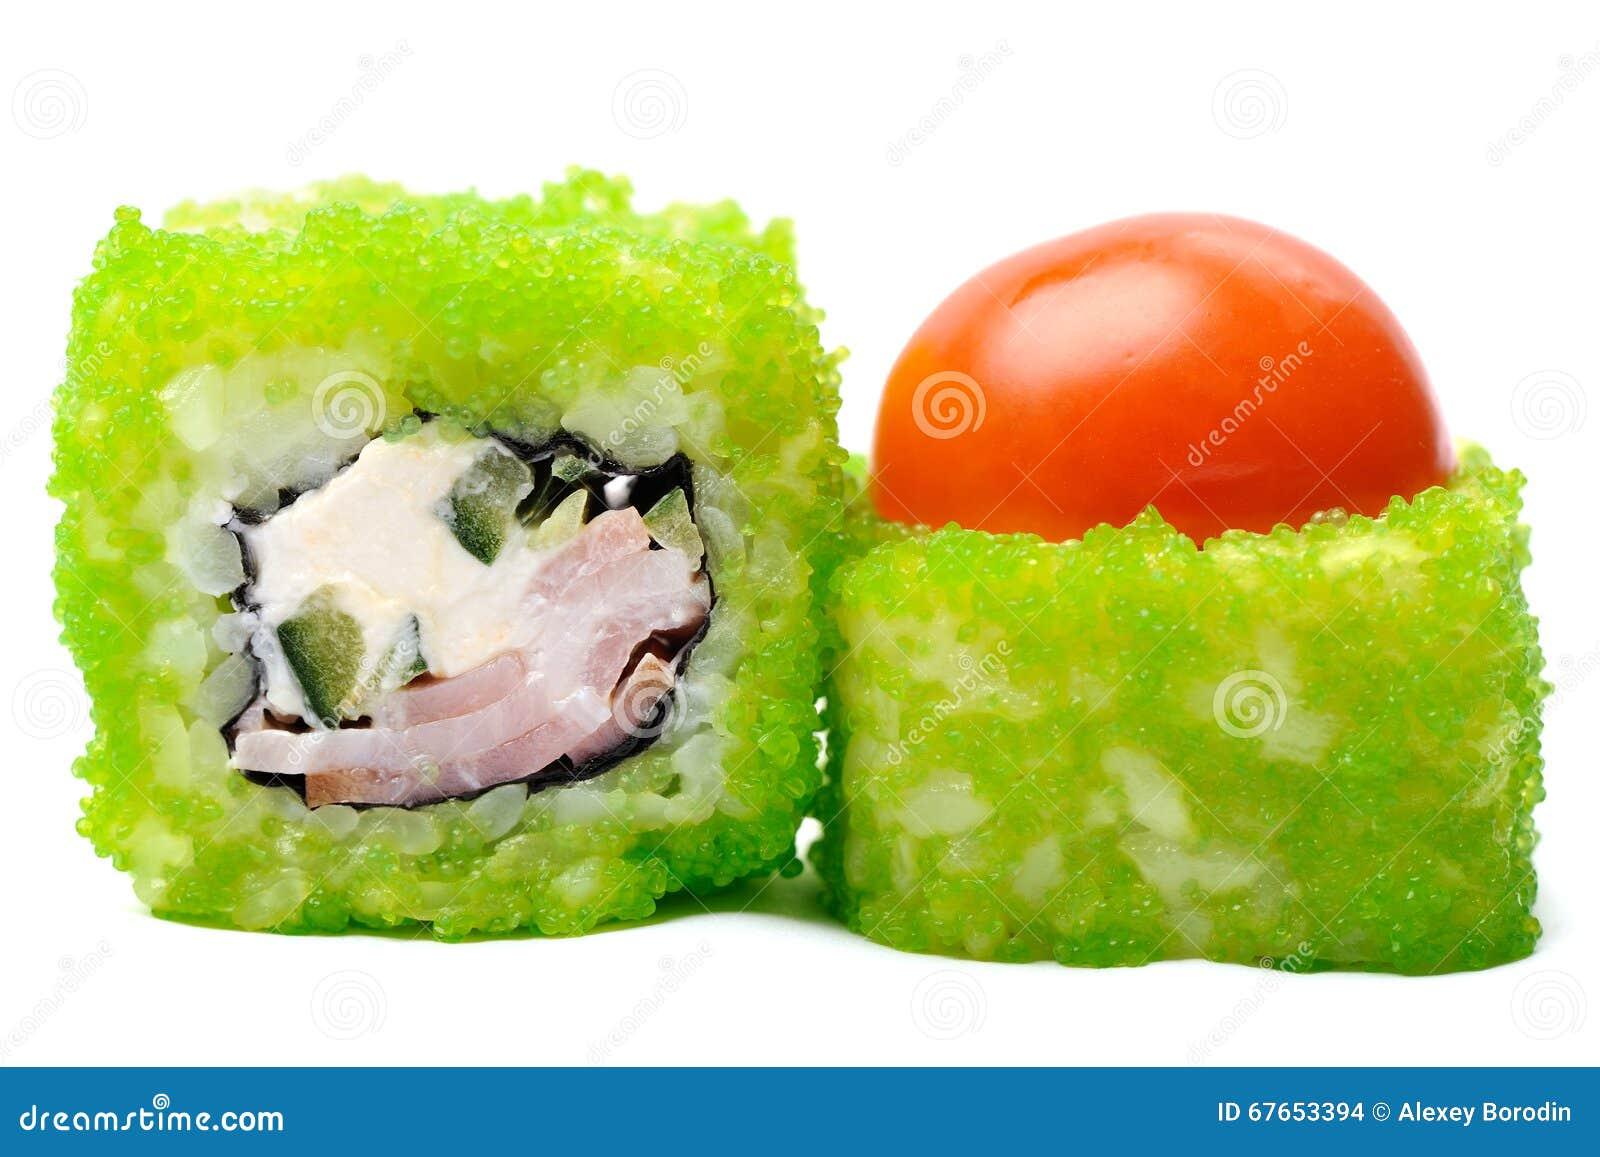 Tasty Japanese Fantasy Rolls With Cherry Tomato, Cucumber